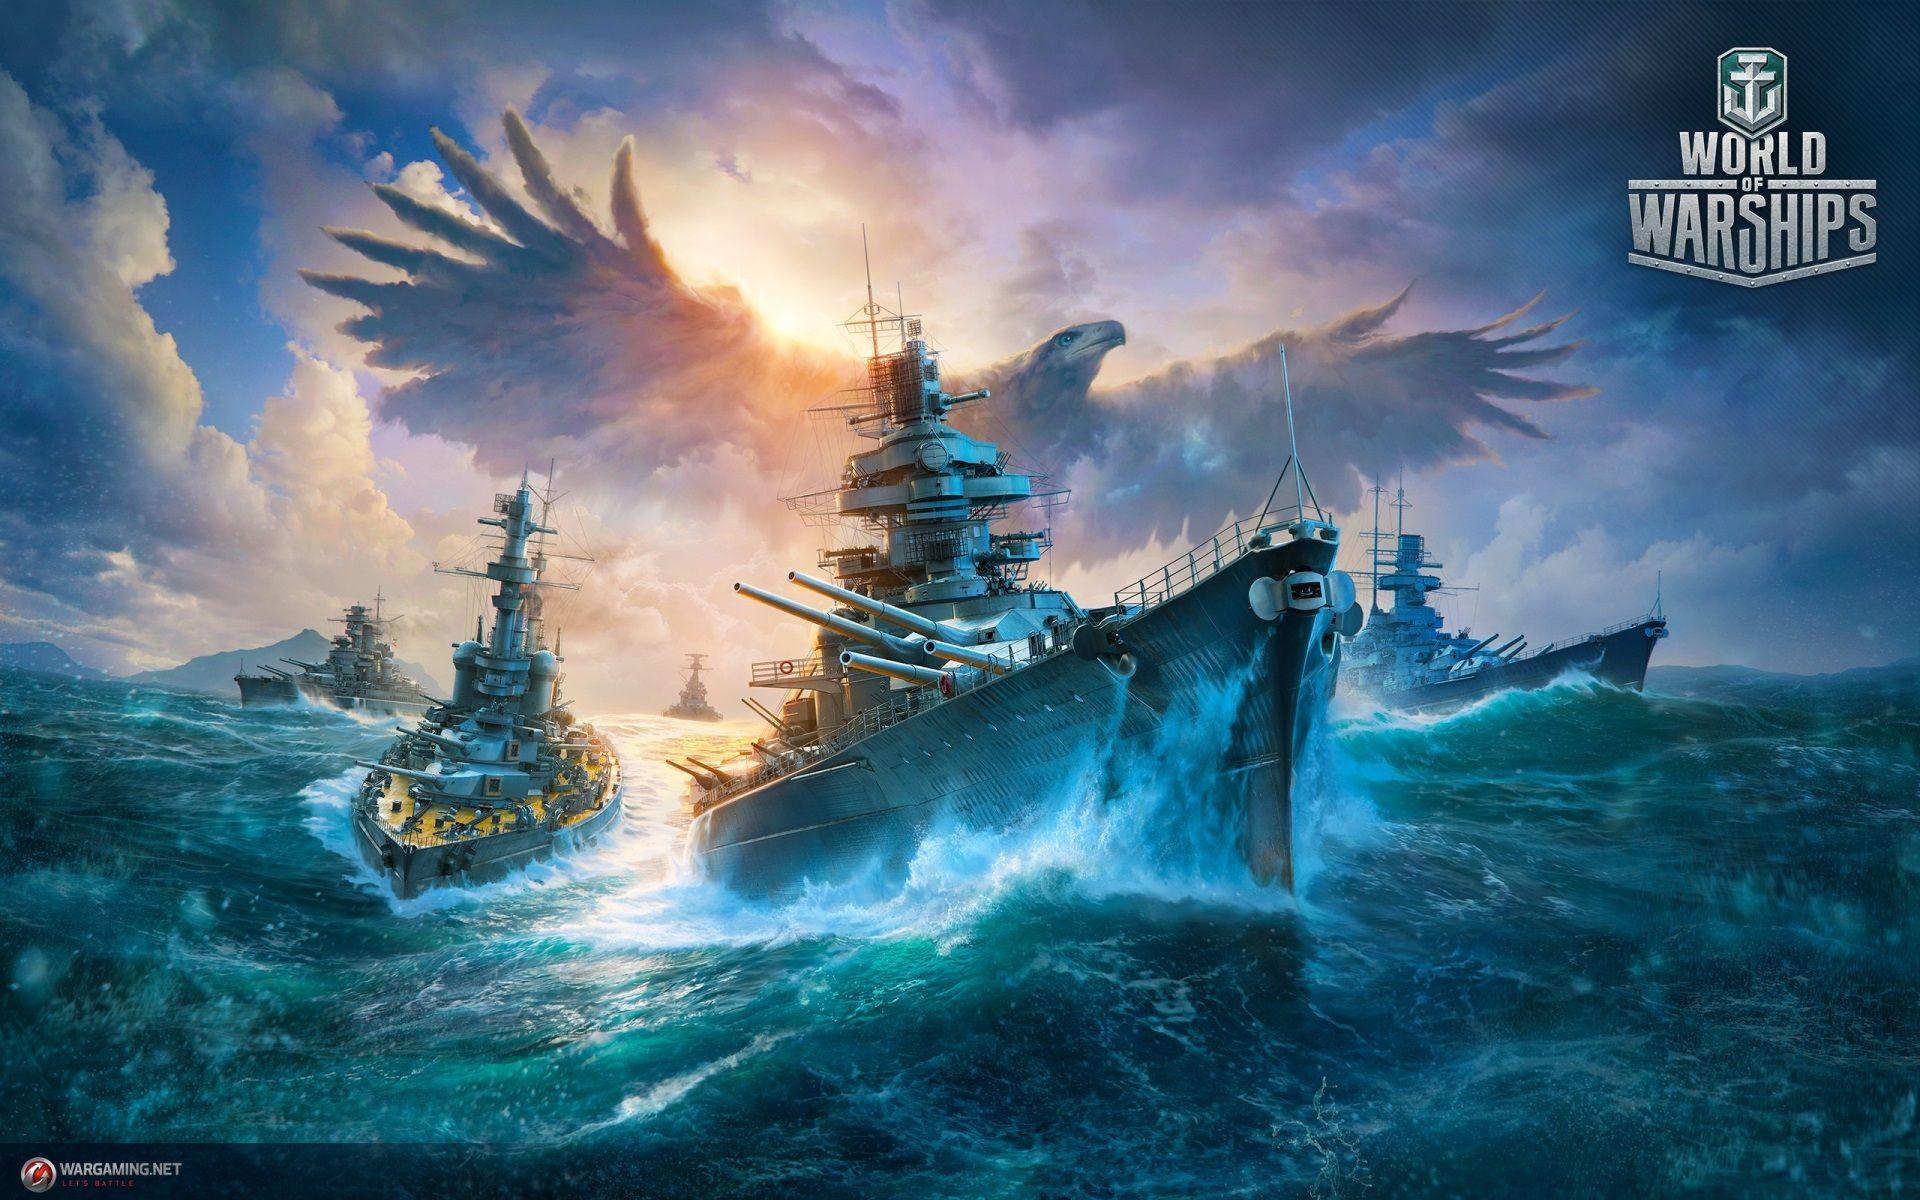 1920x1200 World Of Warships Desktop Wallpaper High Resolution Free